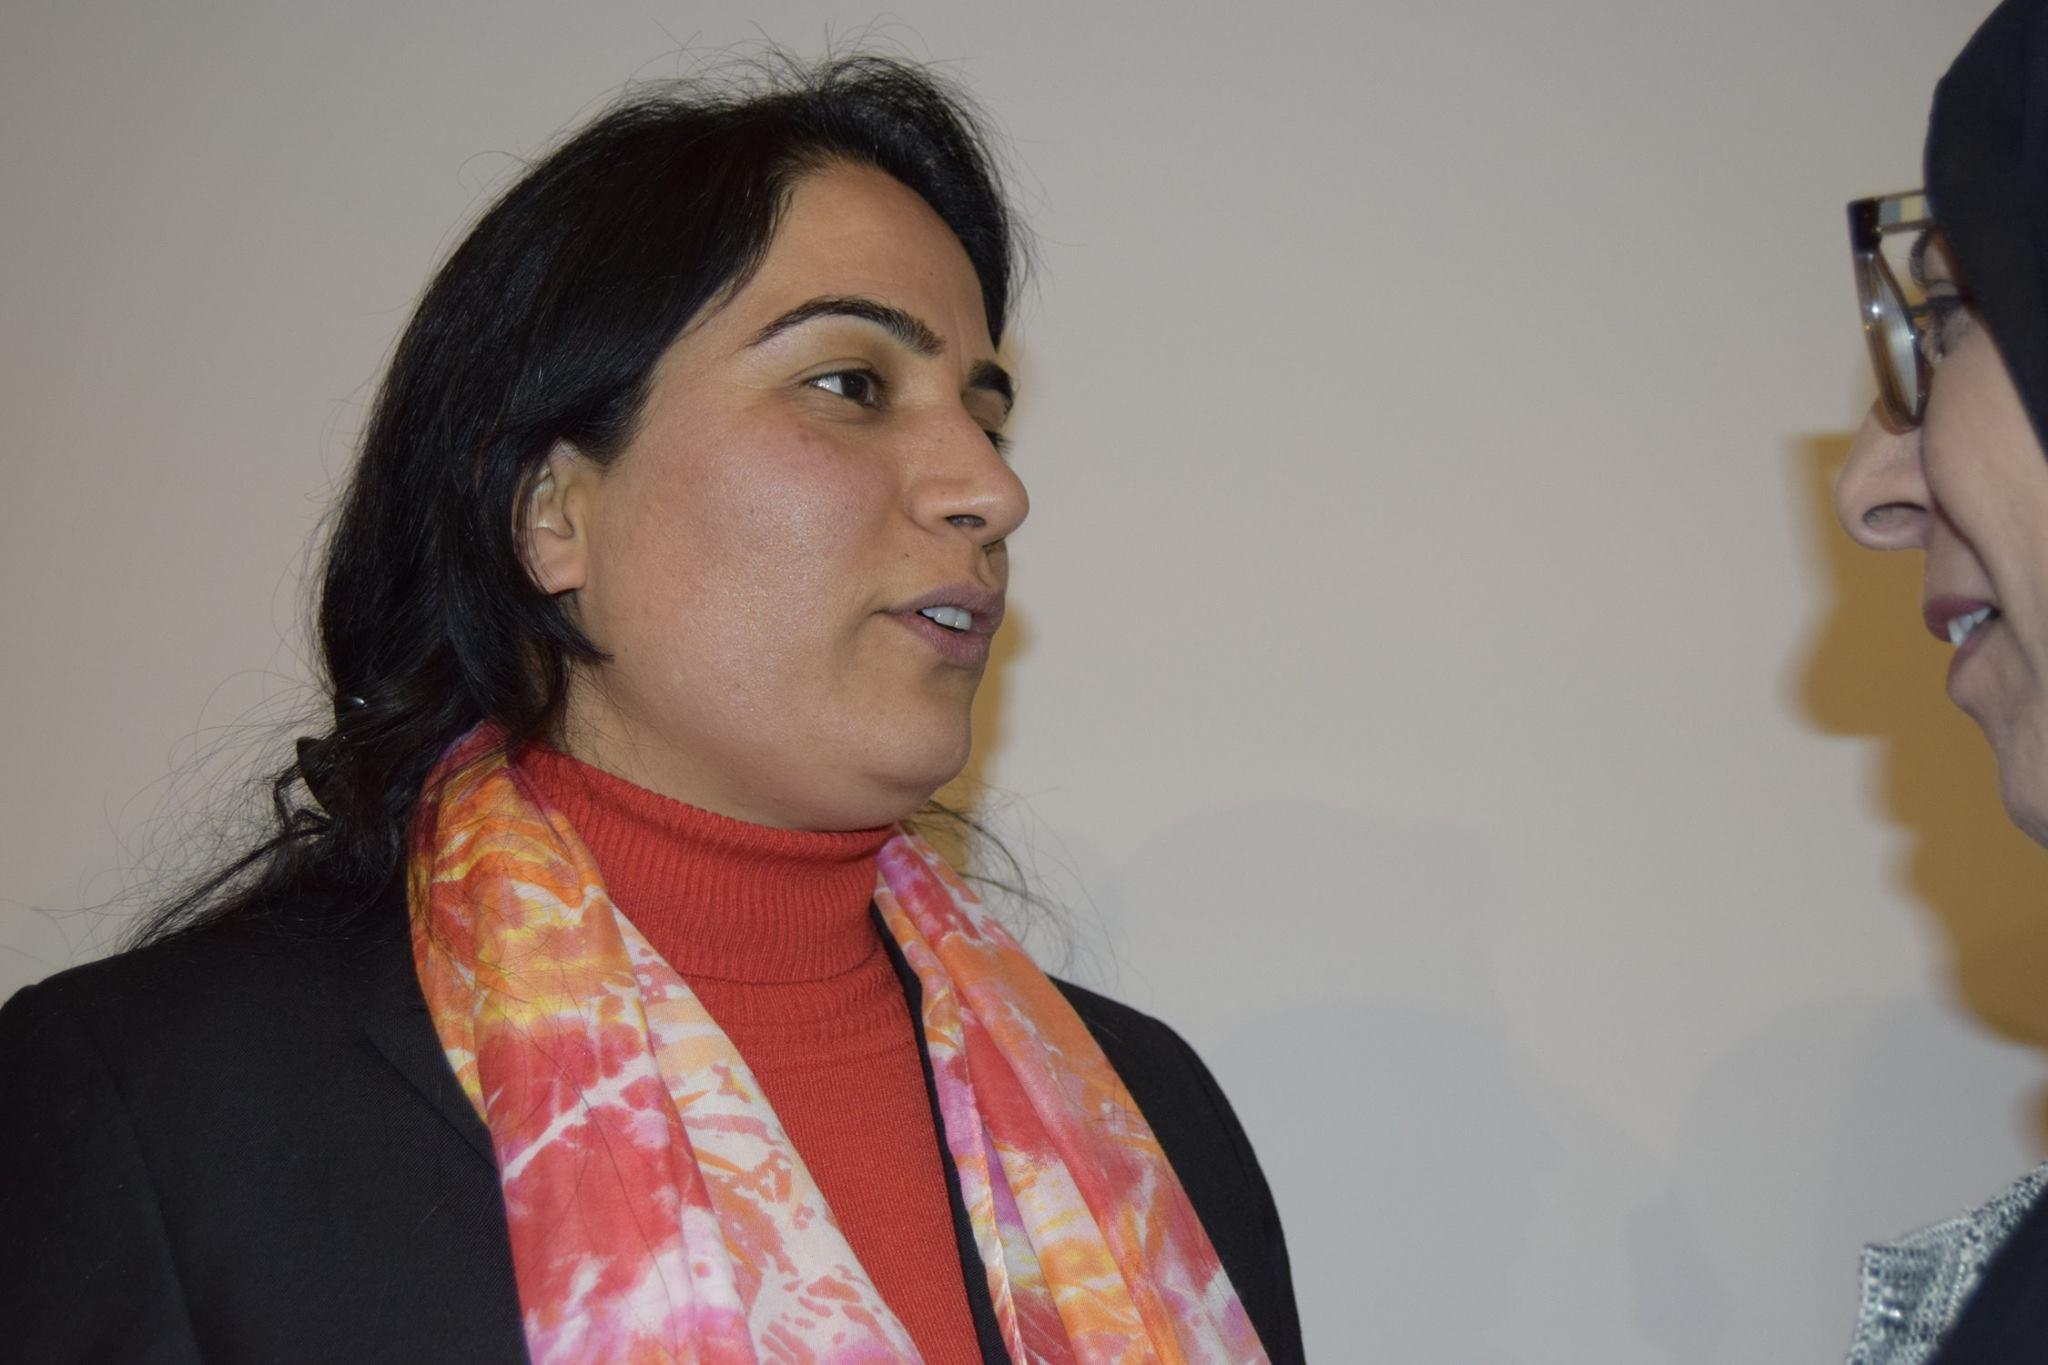 Malalai Joya during her visit in Copenhagen, Denmark. Photo: Mir Jalali.